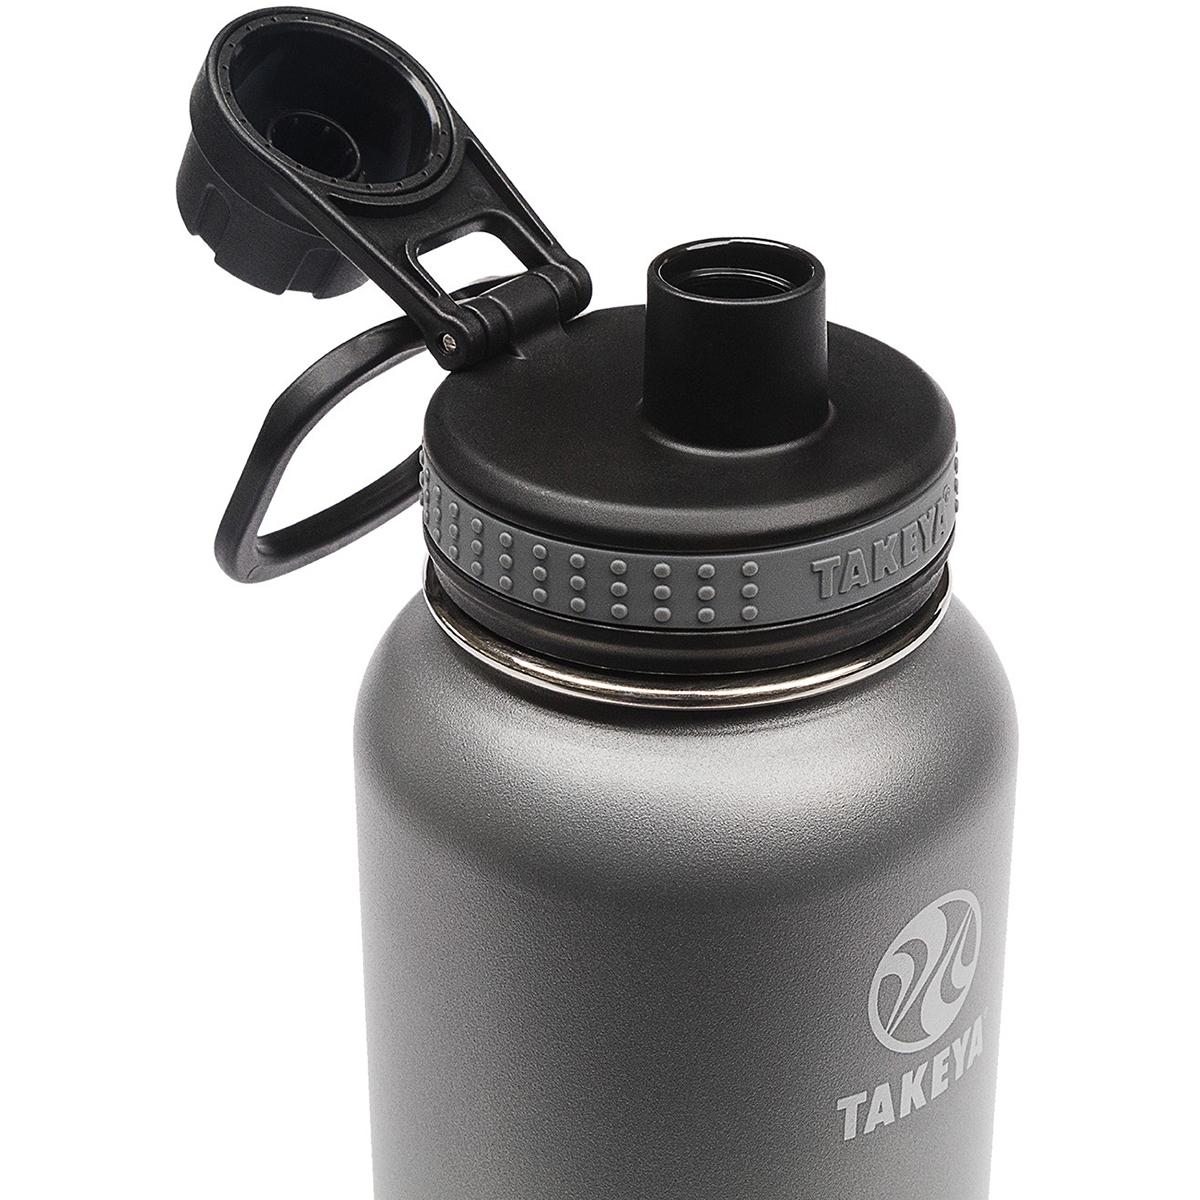 Takeya-Originals-32-oz-Insulated-Stainless-Steel-Water-Bottle thumbnail 7